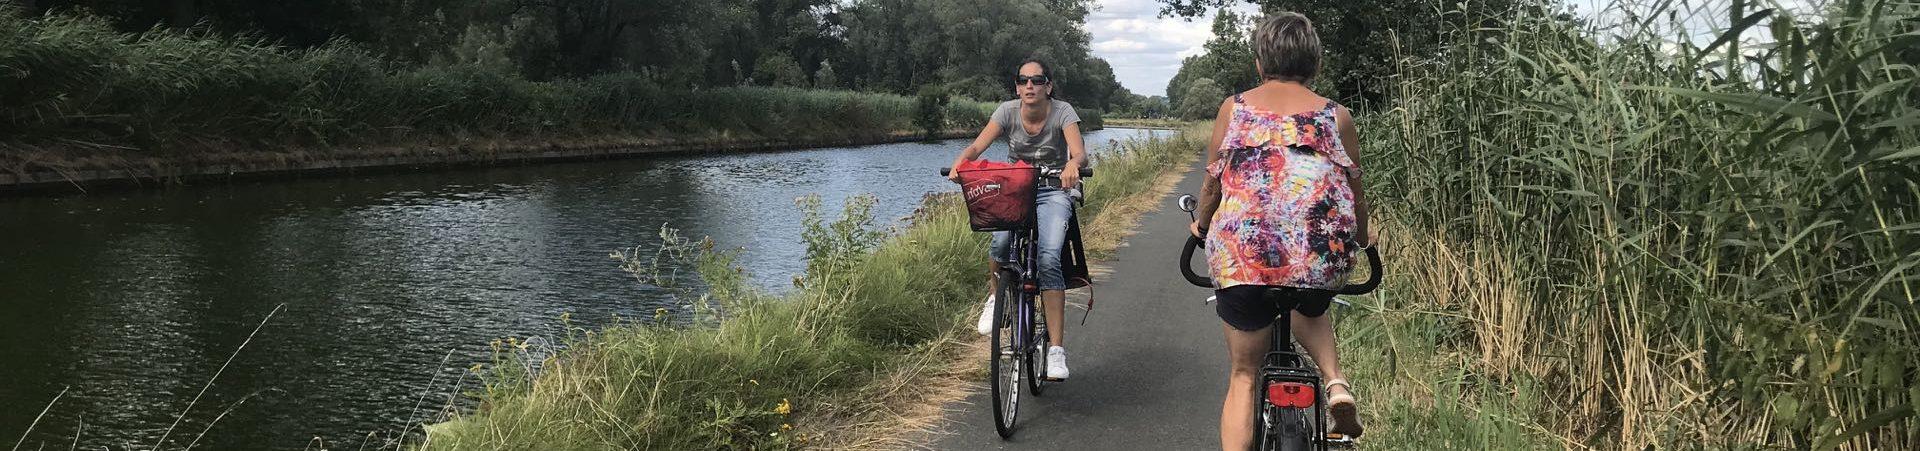 Fietsroute fietsblog Dender Ninove witkap plan bier